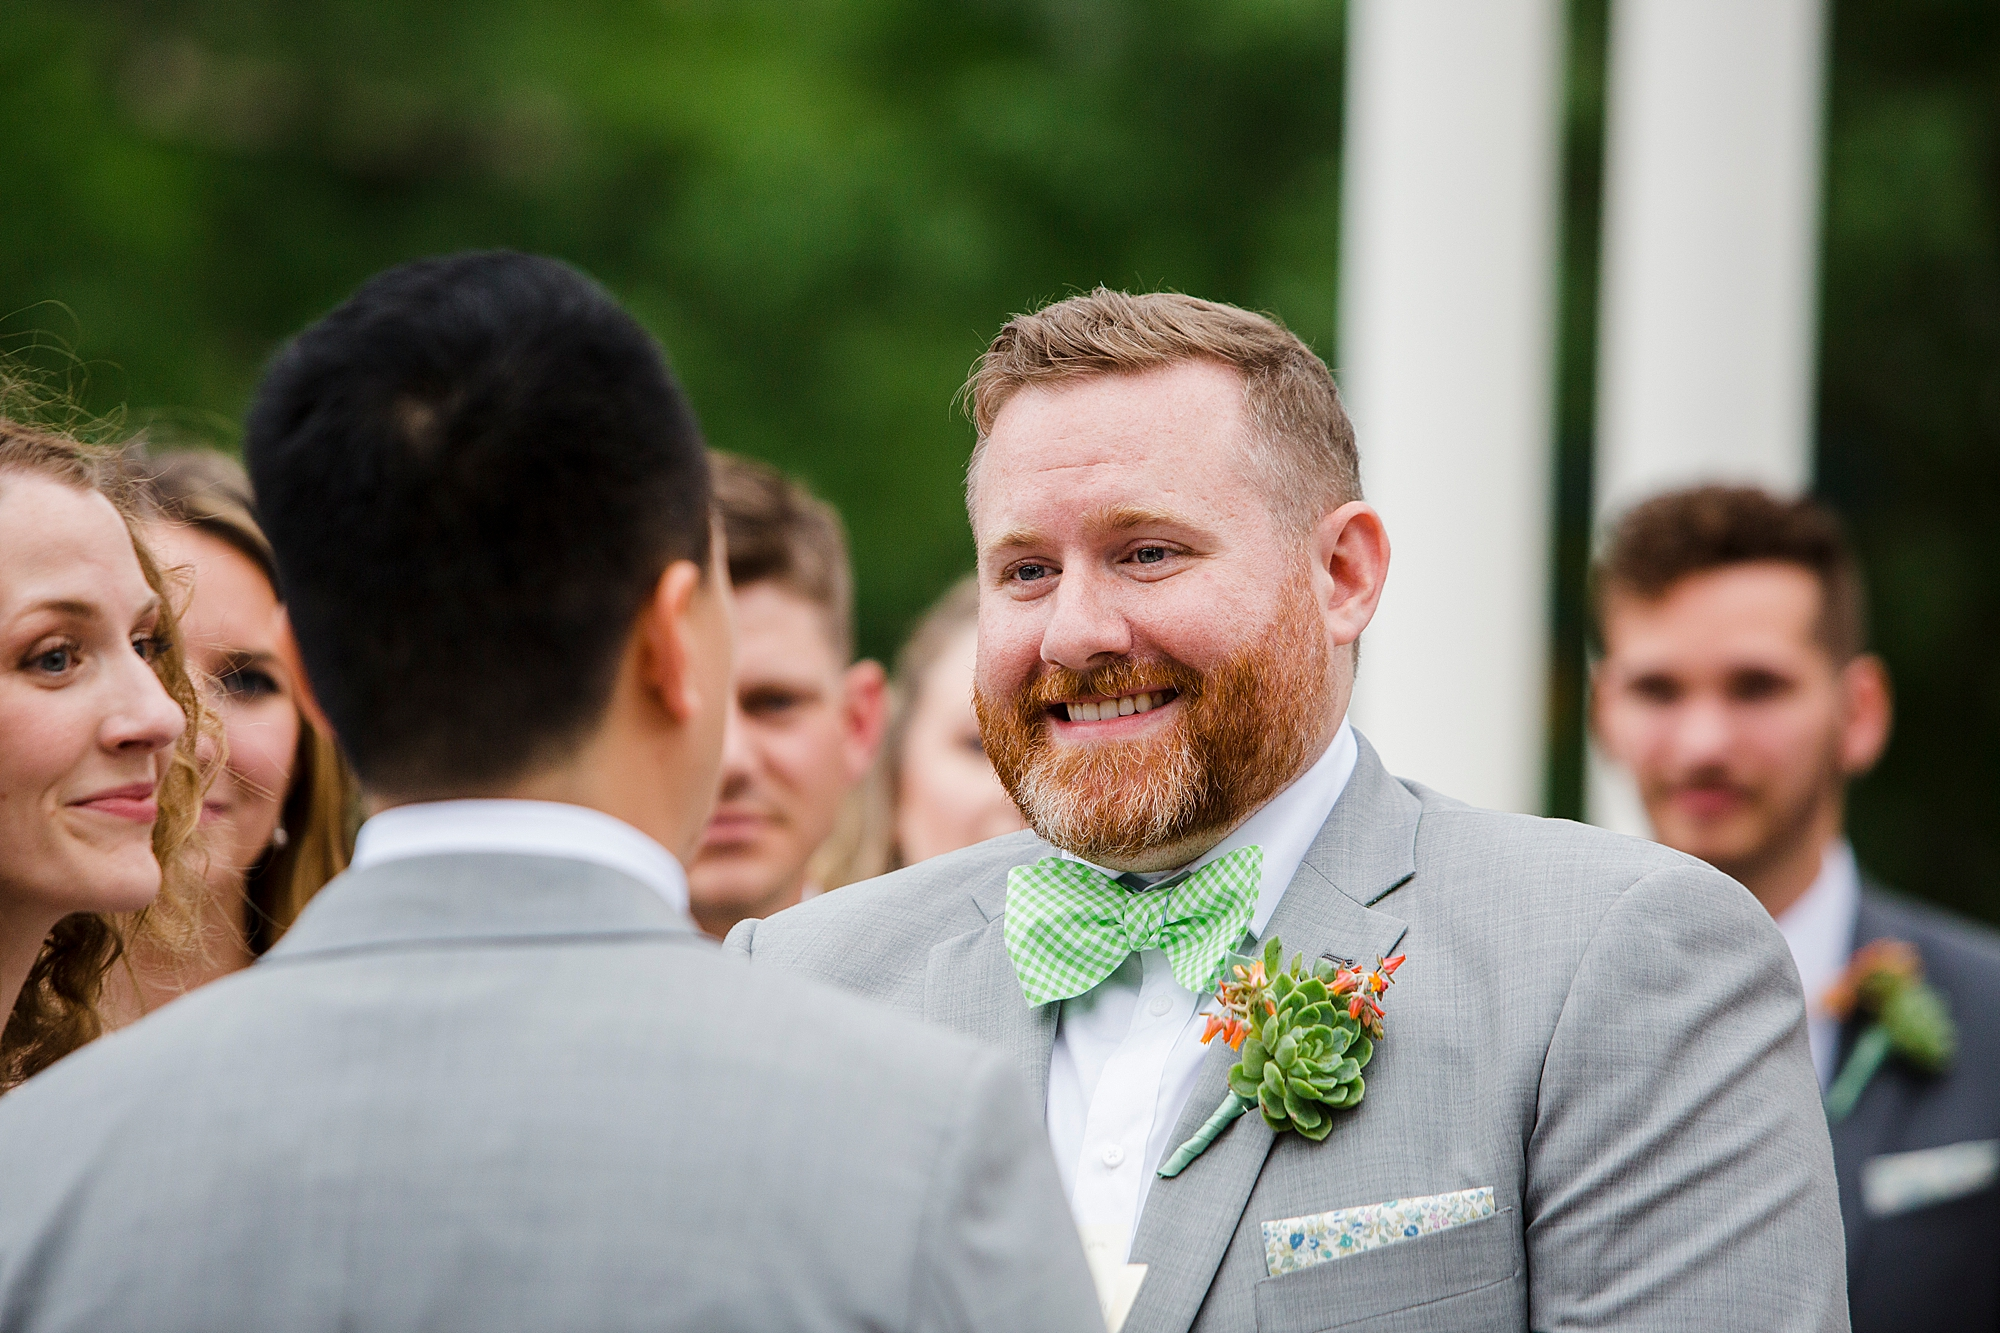 Dan_and_Byron_Love_by_Joe_Mac_Philadelphia_Wedding_LGBTQ_Photography_Gay_Independence_visitor_Center_98.JPG